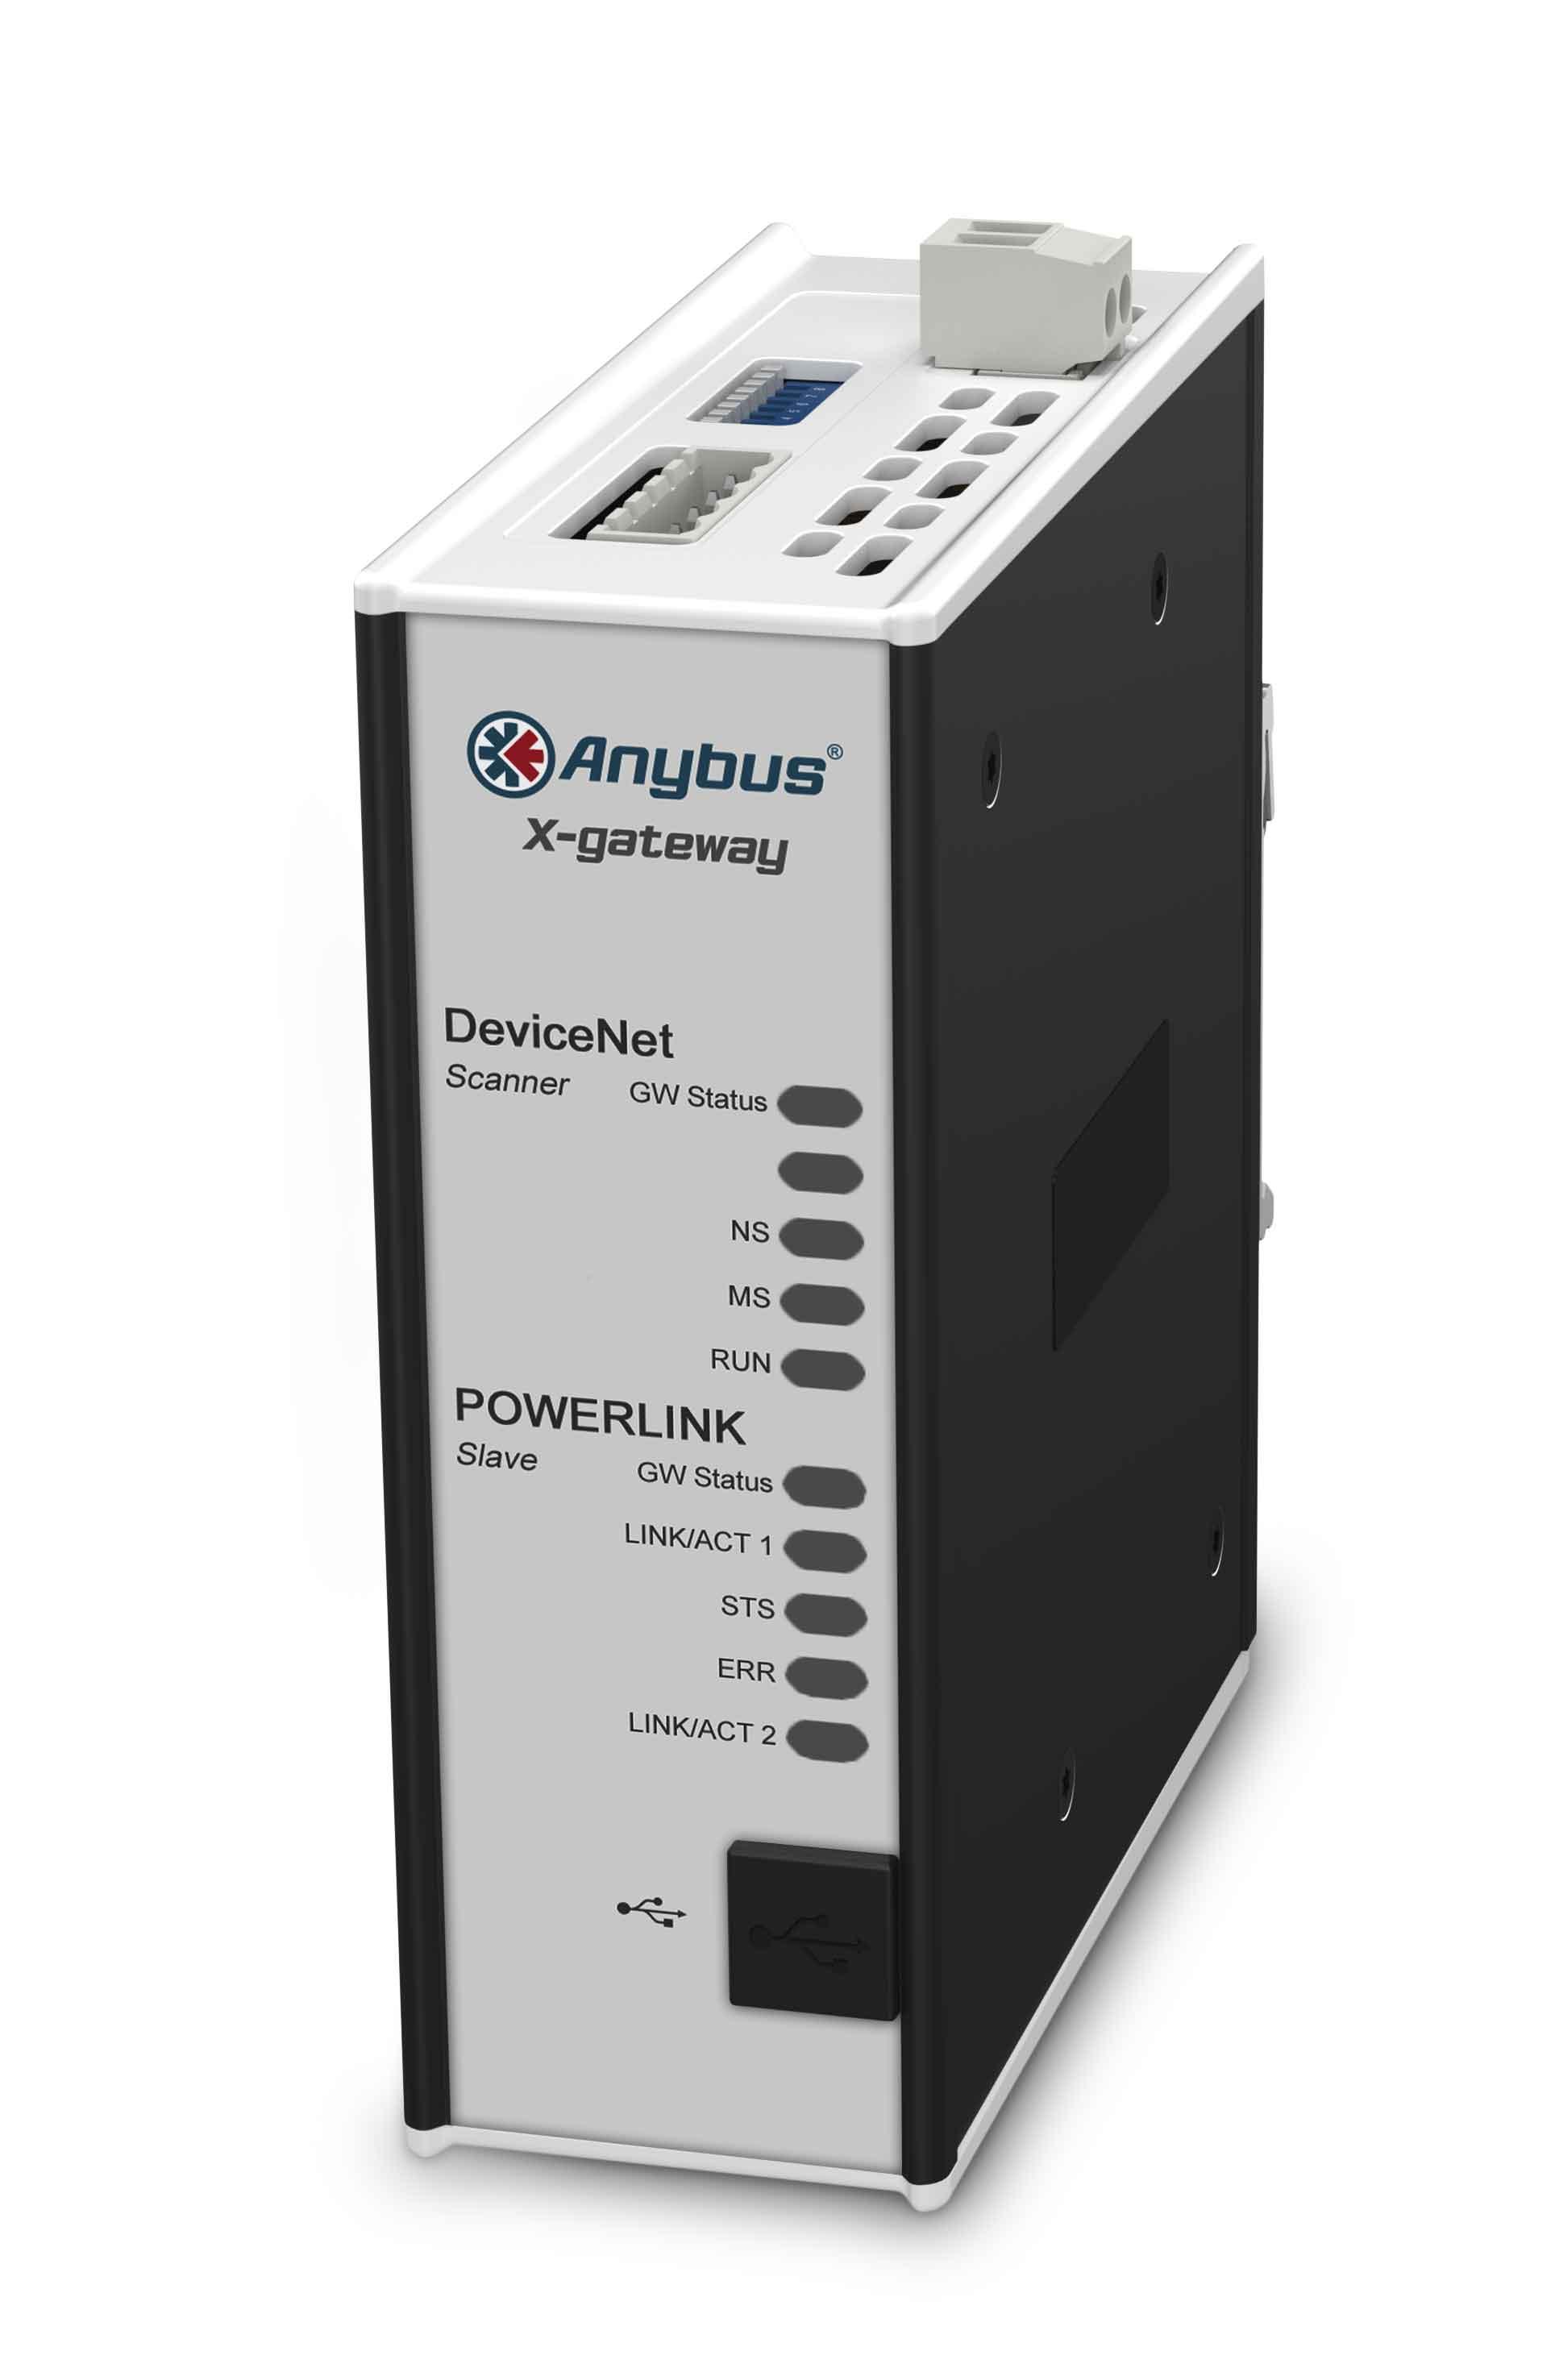 DeviceNet Scanner - POWERLINK Device - AB7522-F